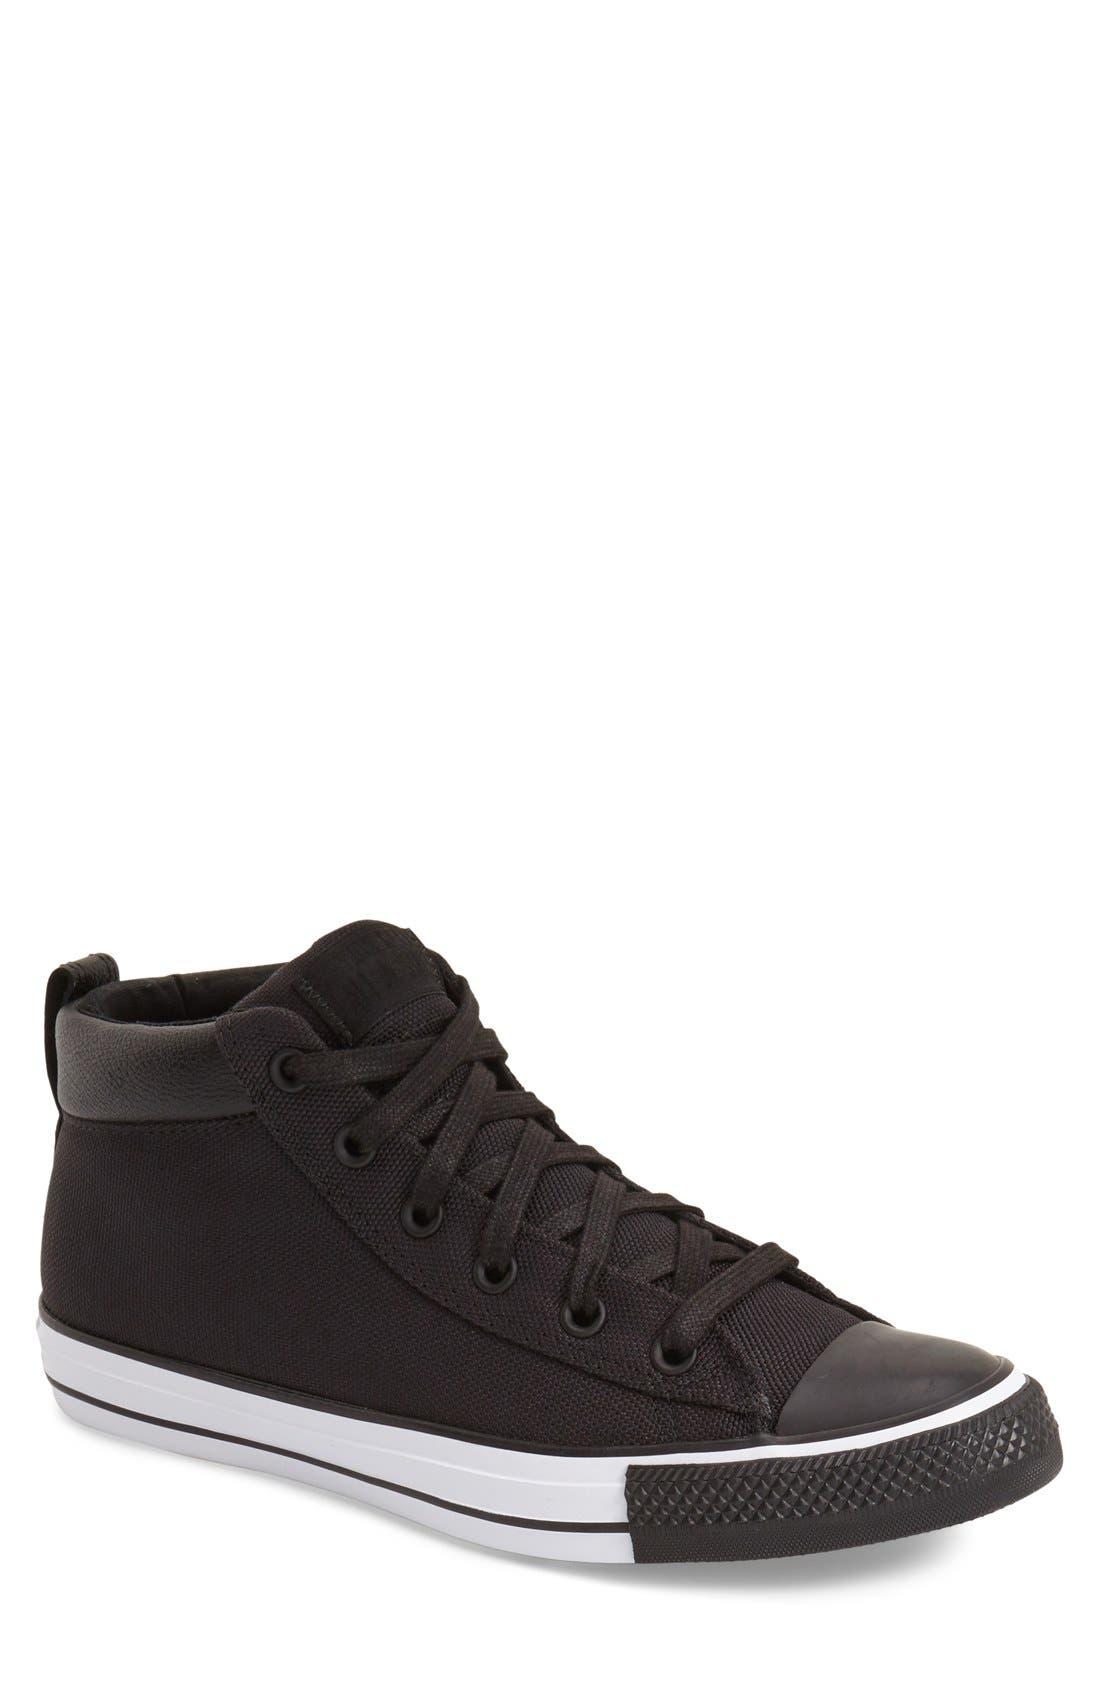 Alternate Image 1 Selected - Converse Chuck Taylor® All Star® 'Street' High Top Sneaker (Men)